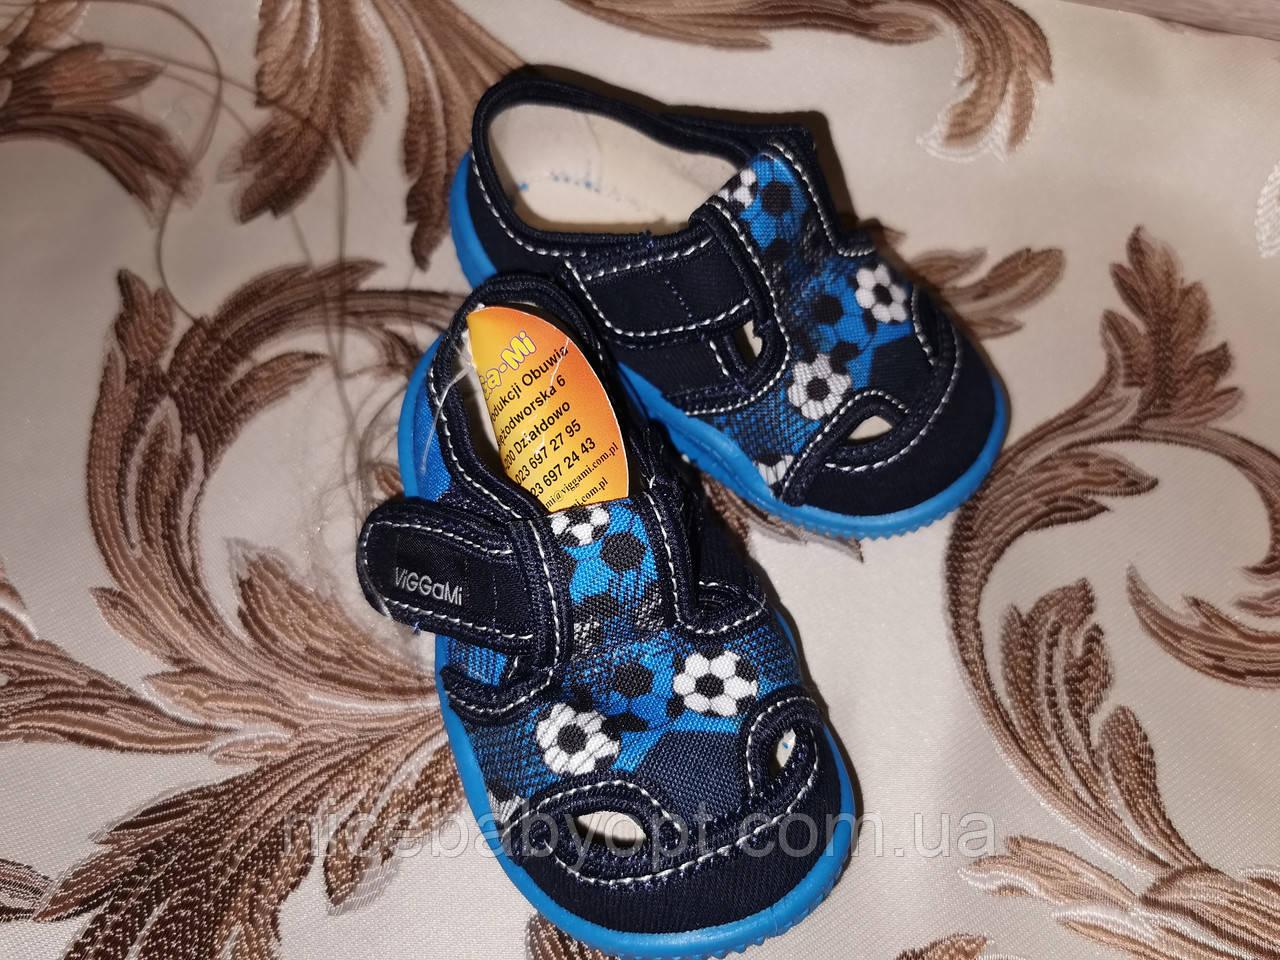 Тапочки для мальчика ViGGaMi Adas Maly 20 р.